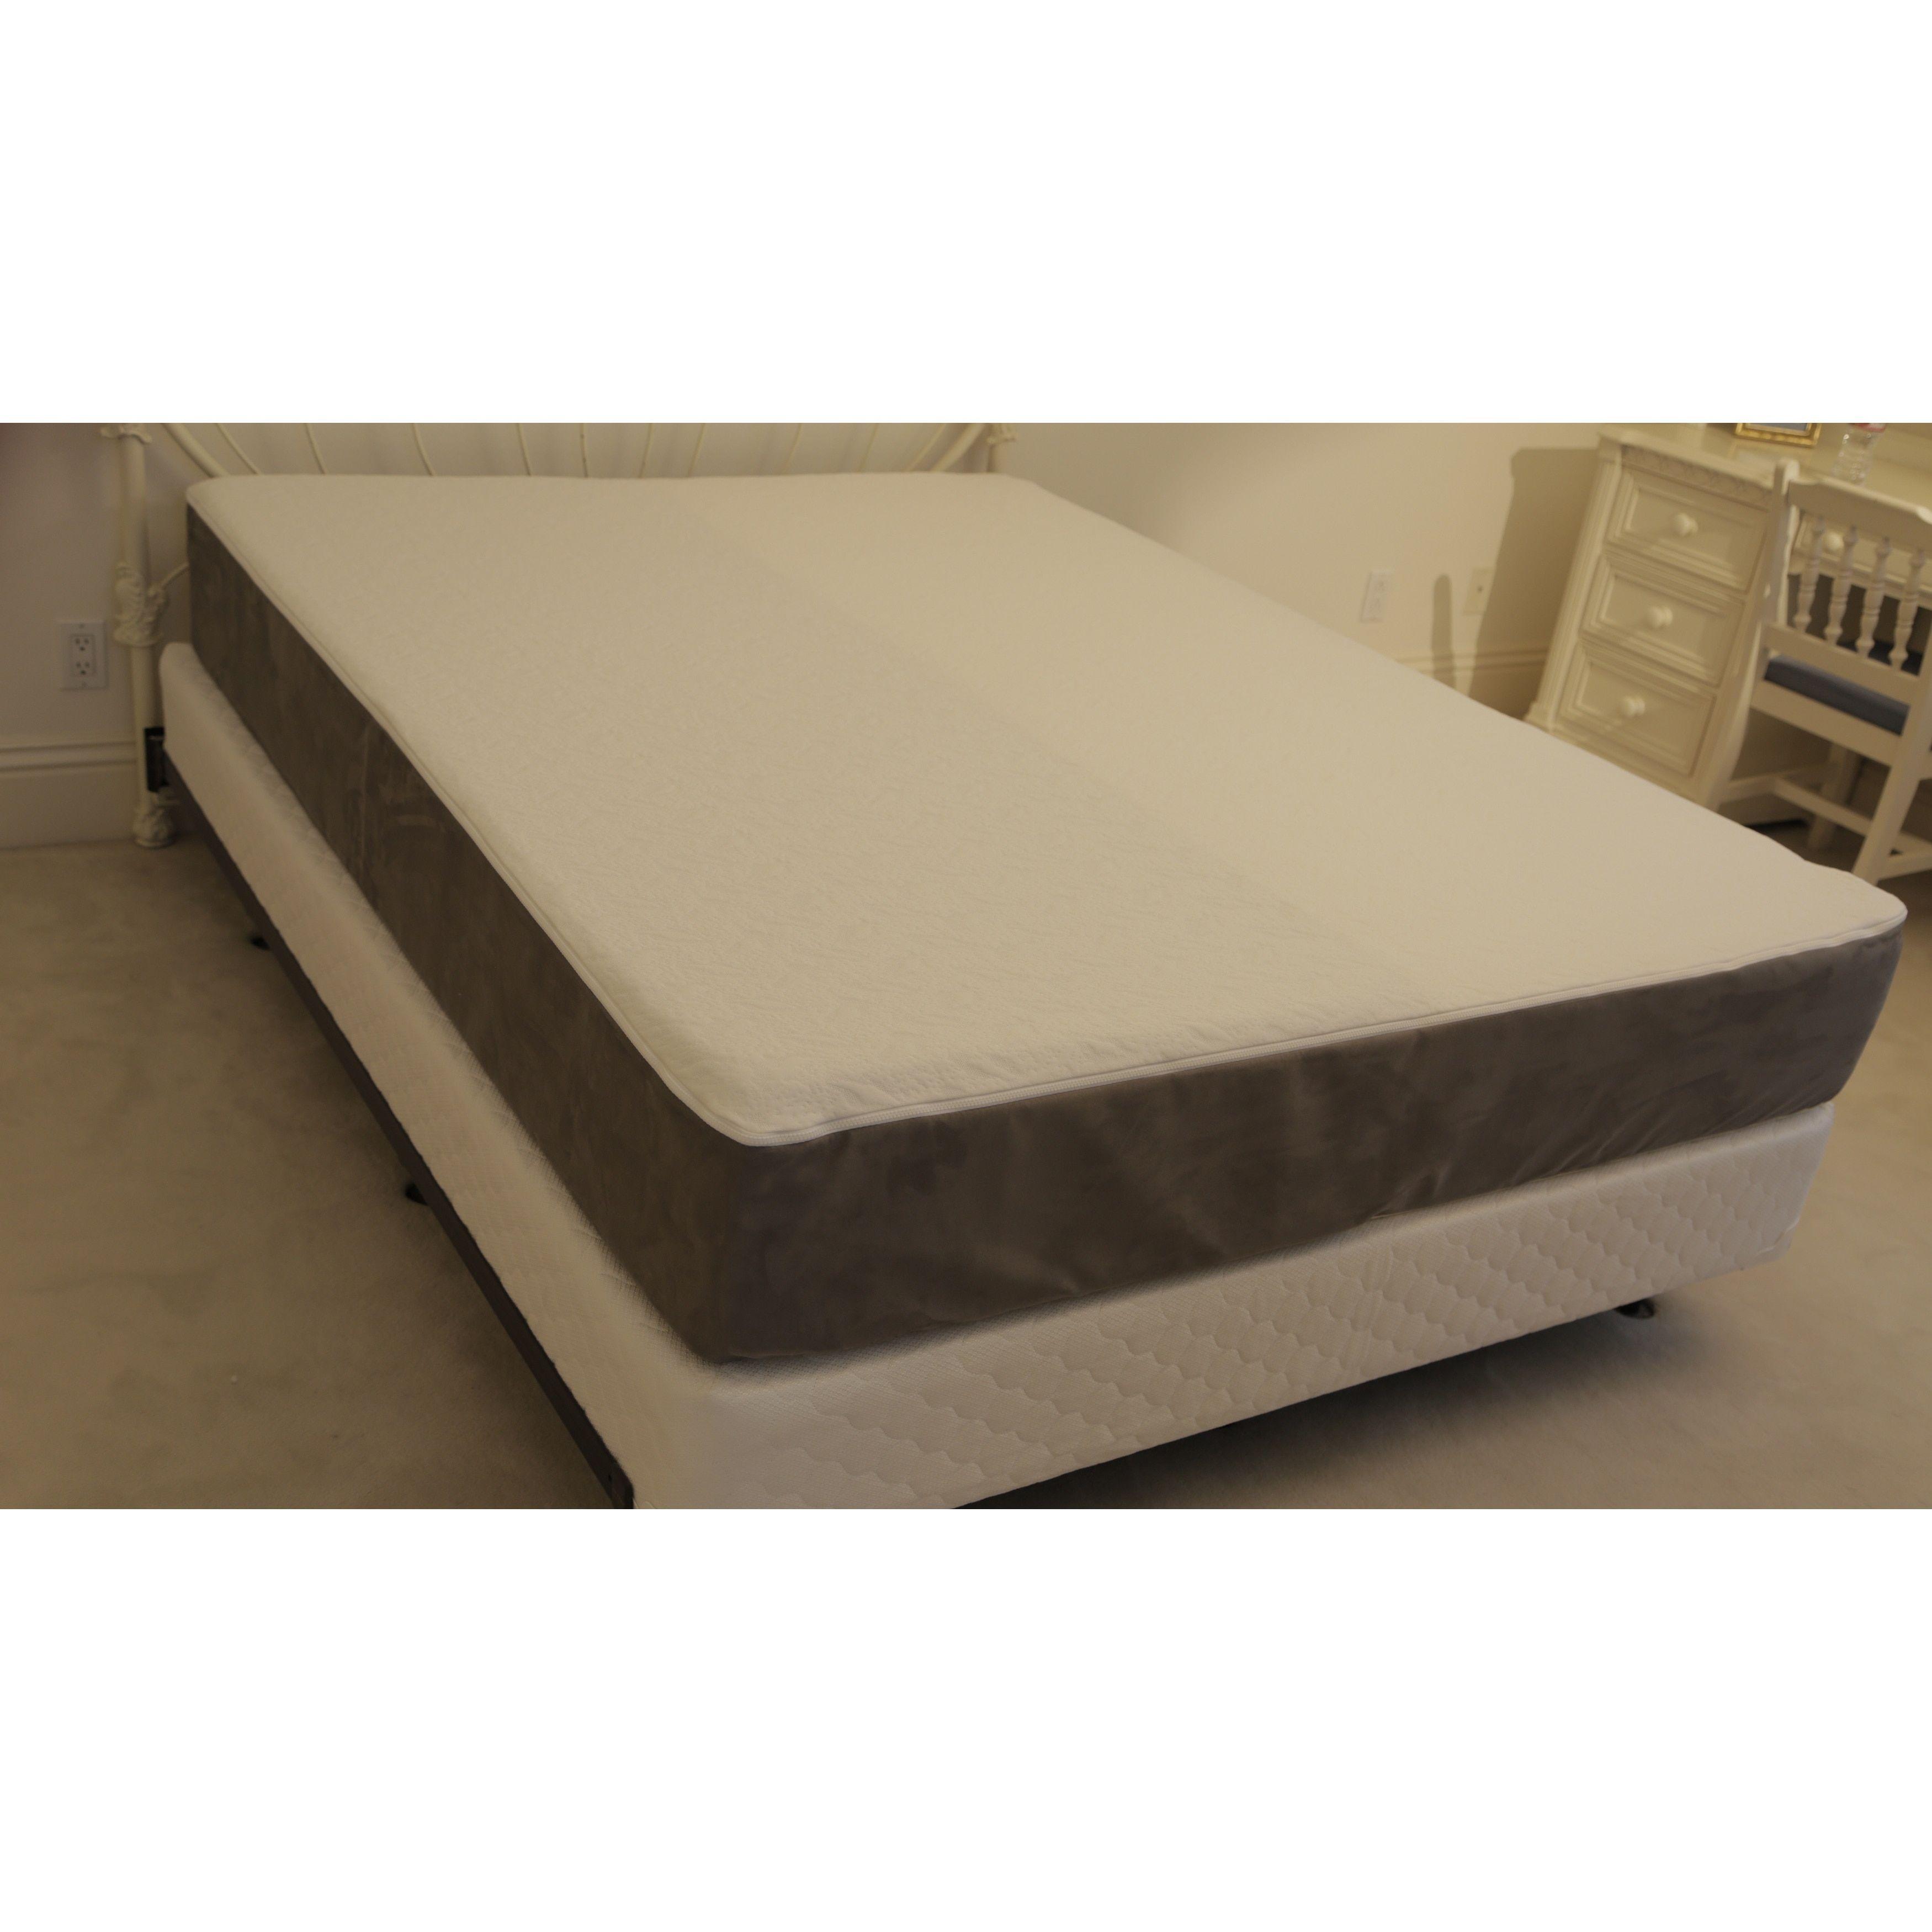 Laguna 8-inch Twin XL-size Adjustable Firmness Gel Memory Foam Mattress  (Standard